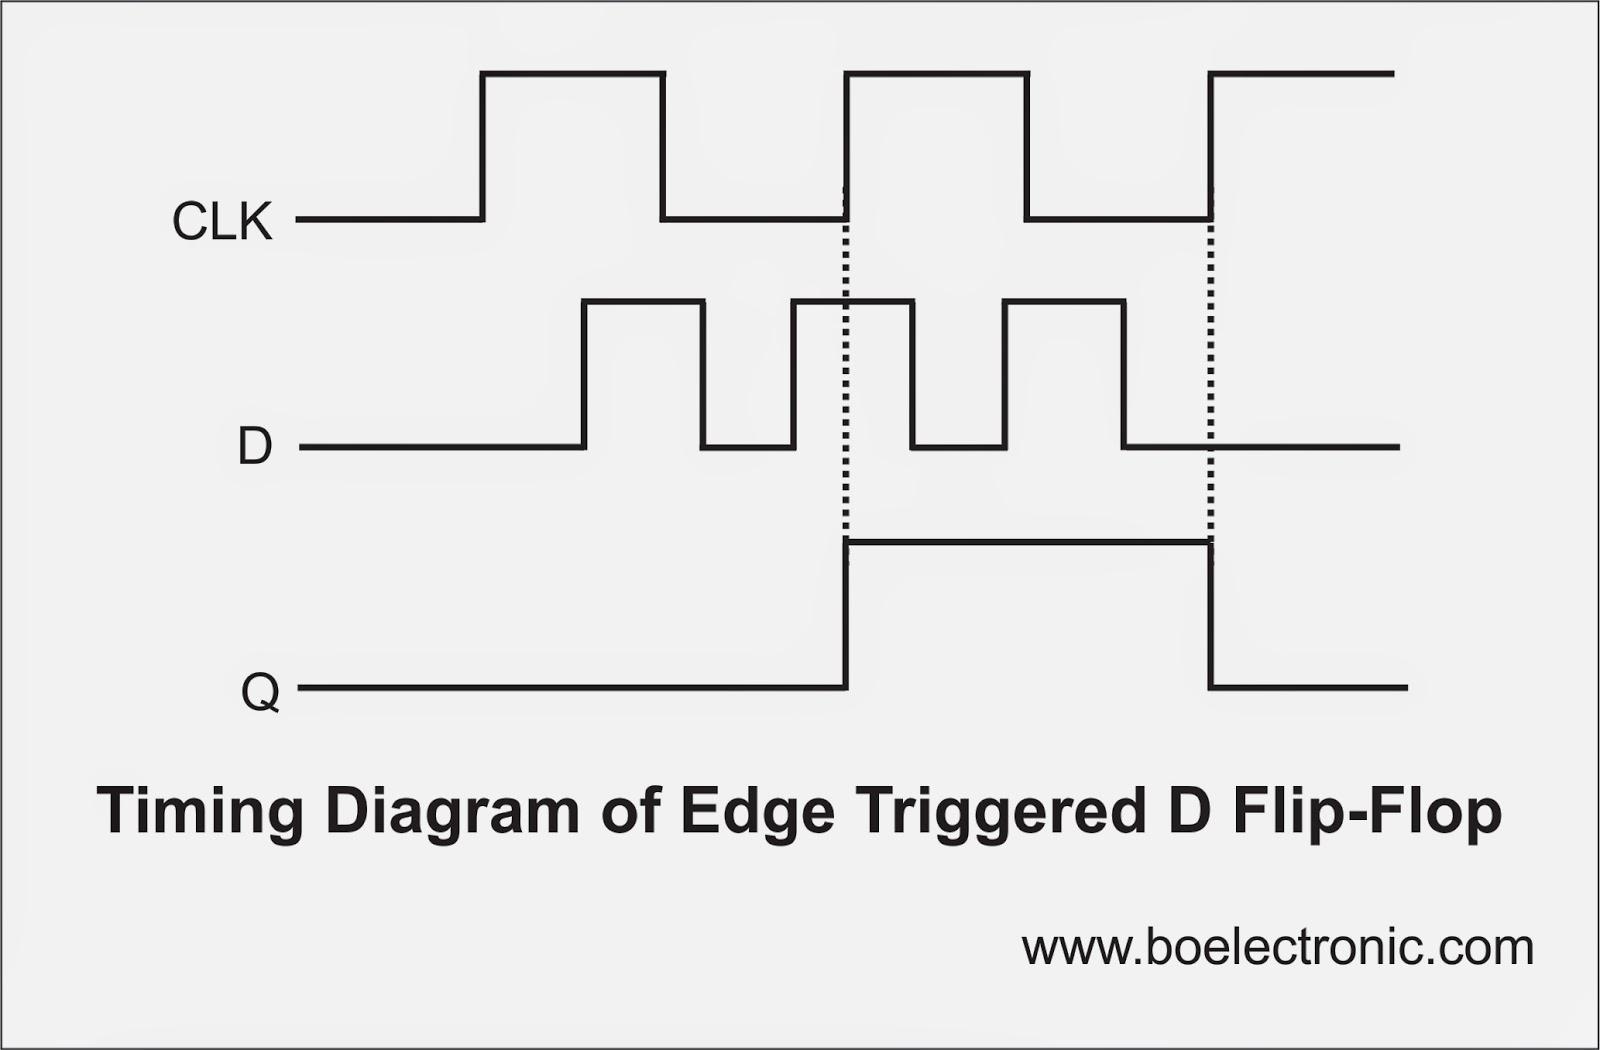 d latch timing diagram | Diarra